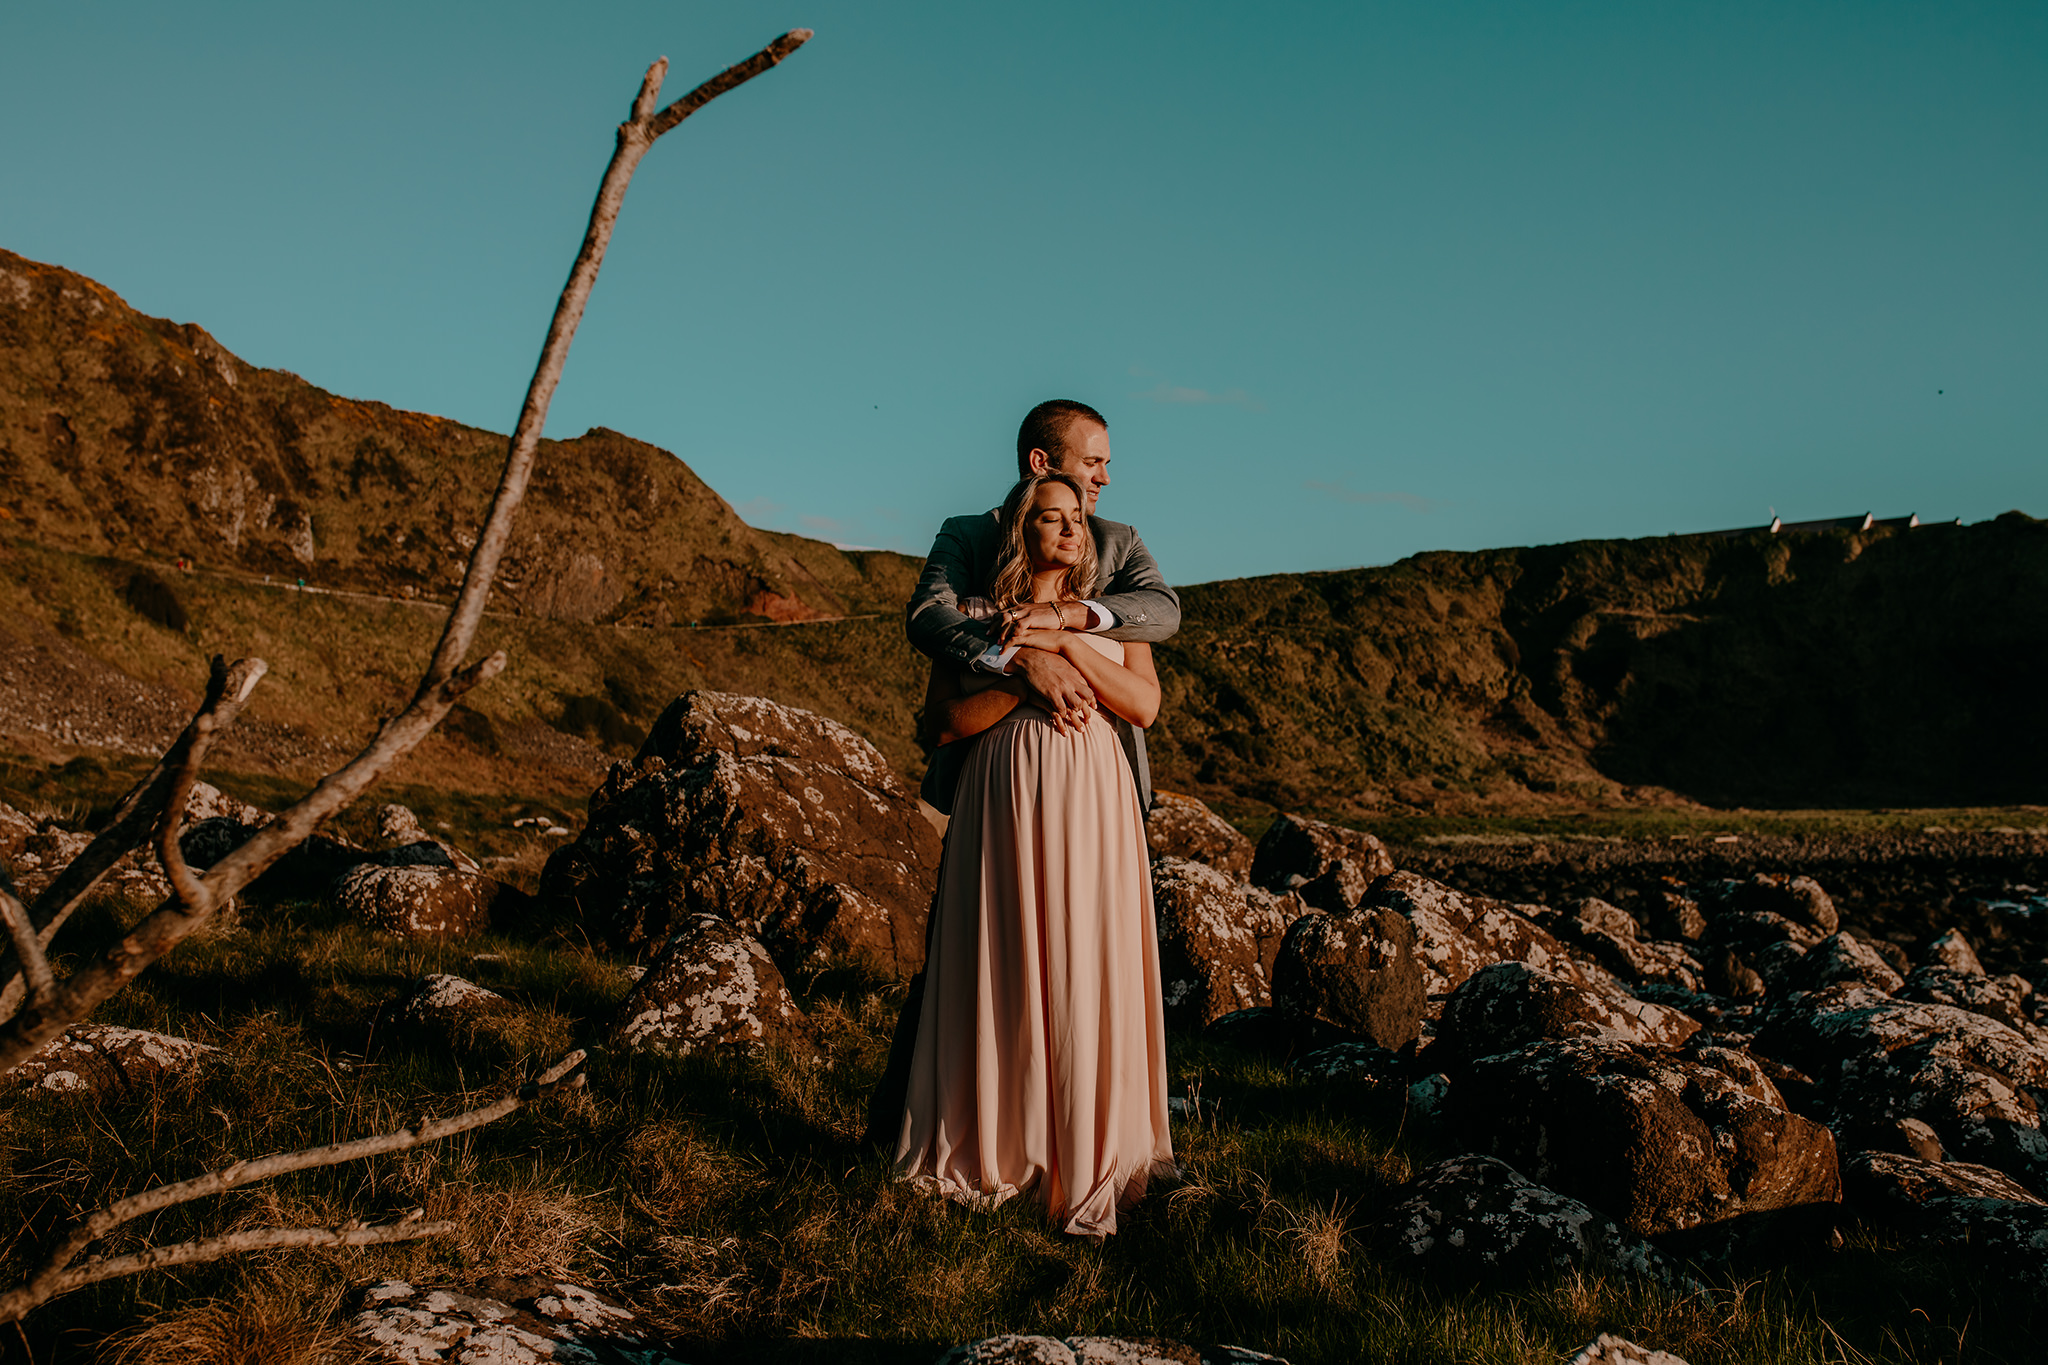 dunluce+castle+maternity+photographer+northern+ireland (3).jpg